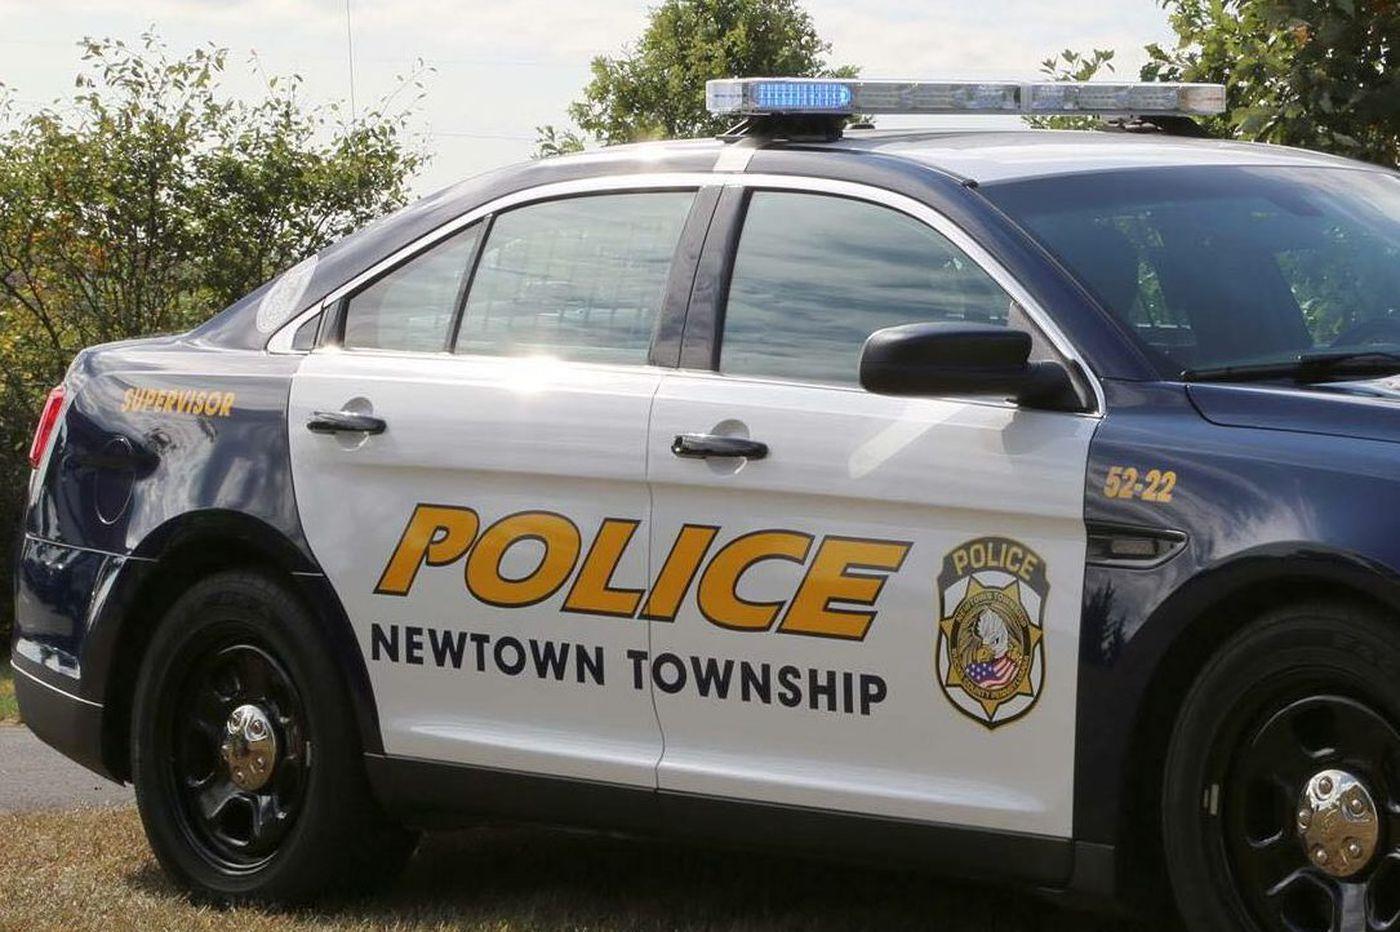 Bucks college campus in Newtown closed Wednesday due to threat